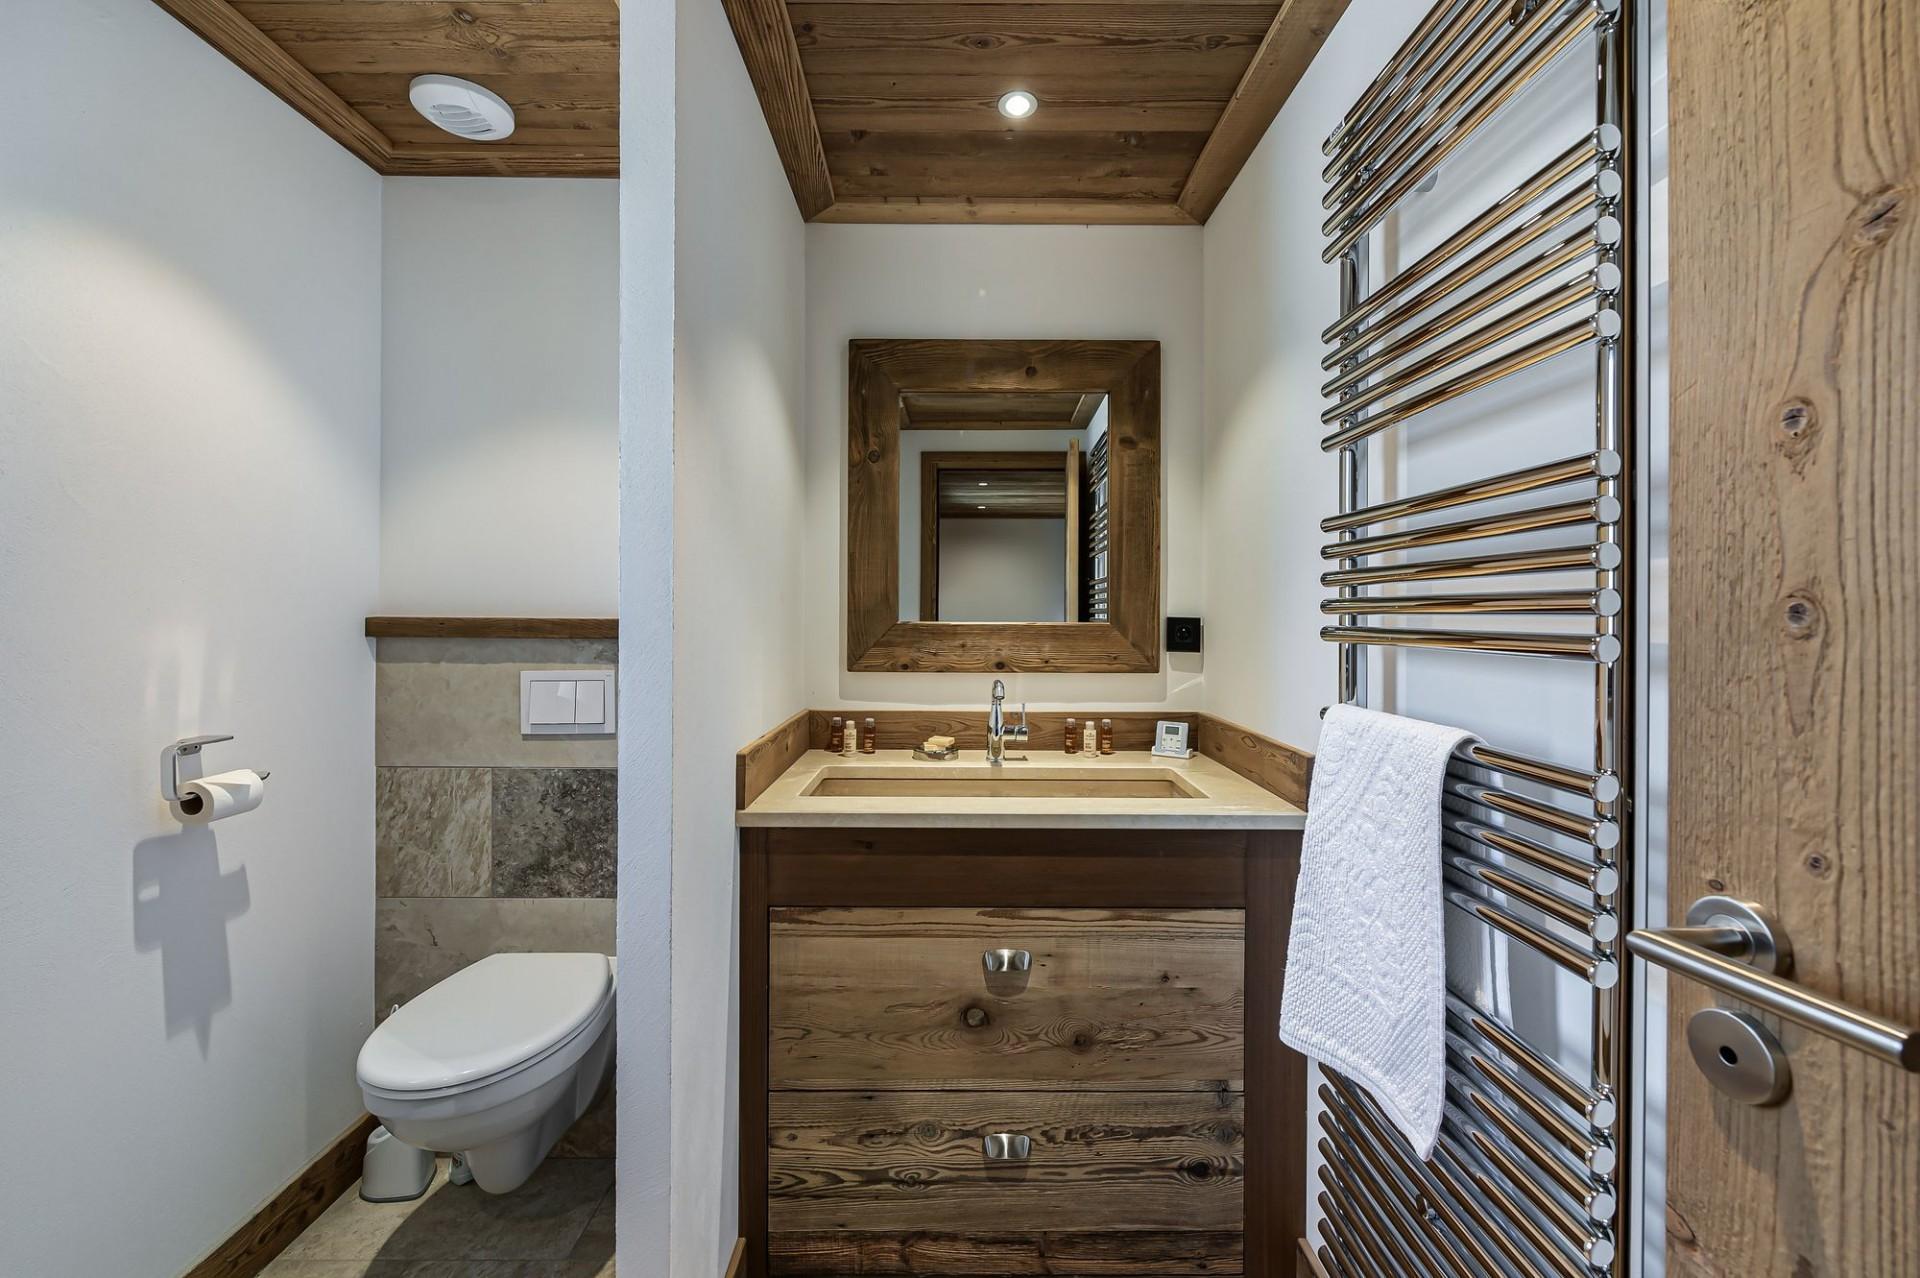 Courchevel 1300 Luxury Rental Appartment Tilite Bathroom 3